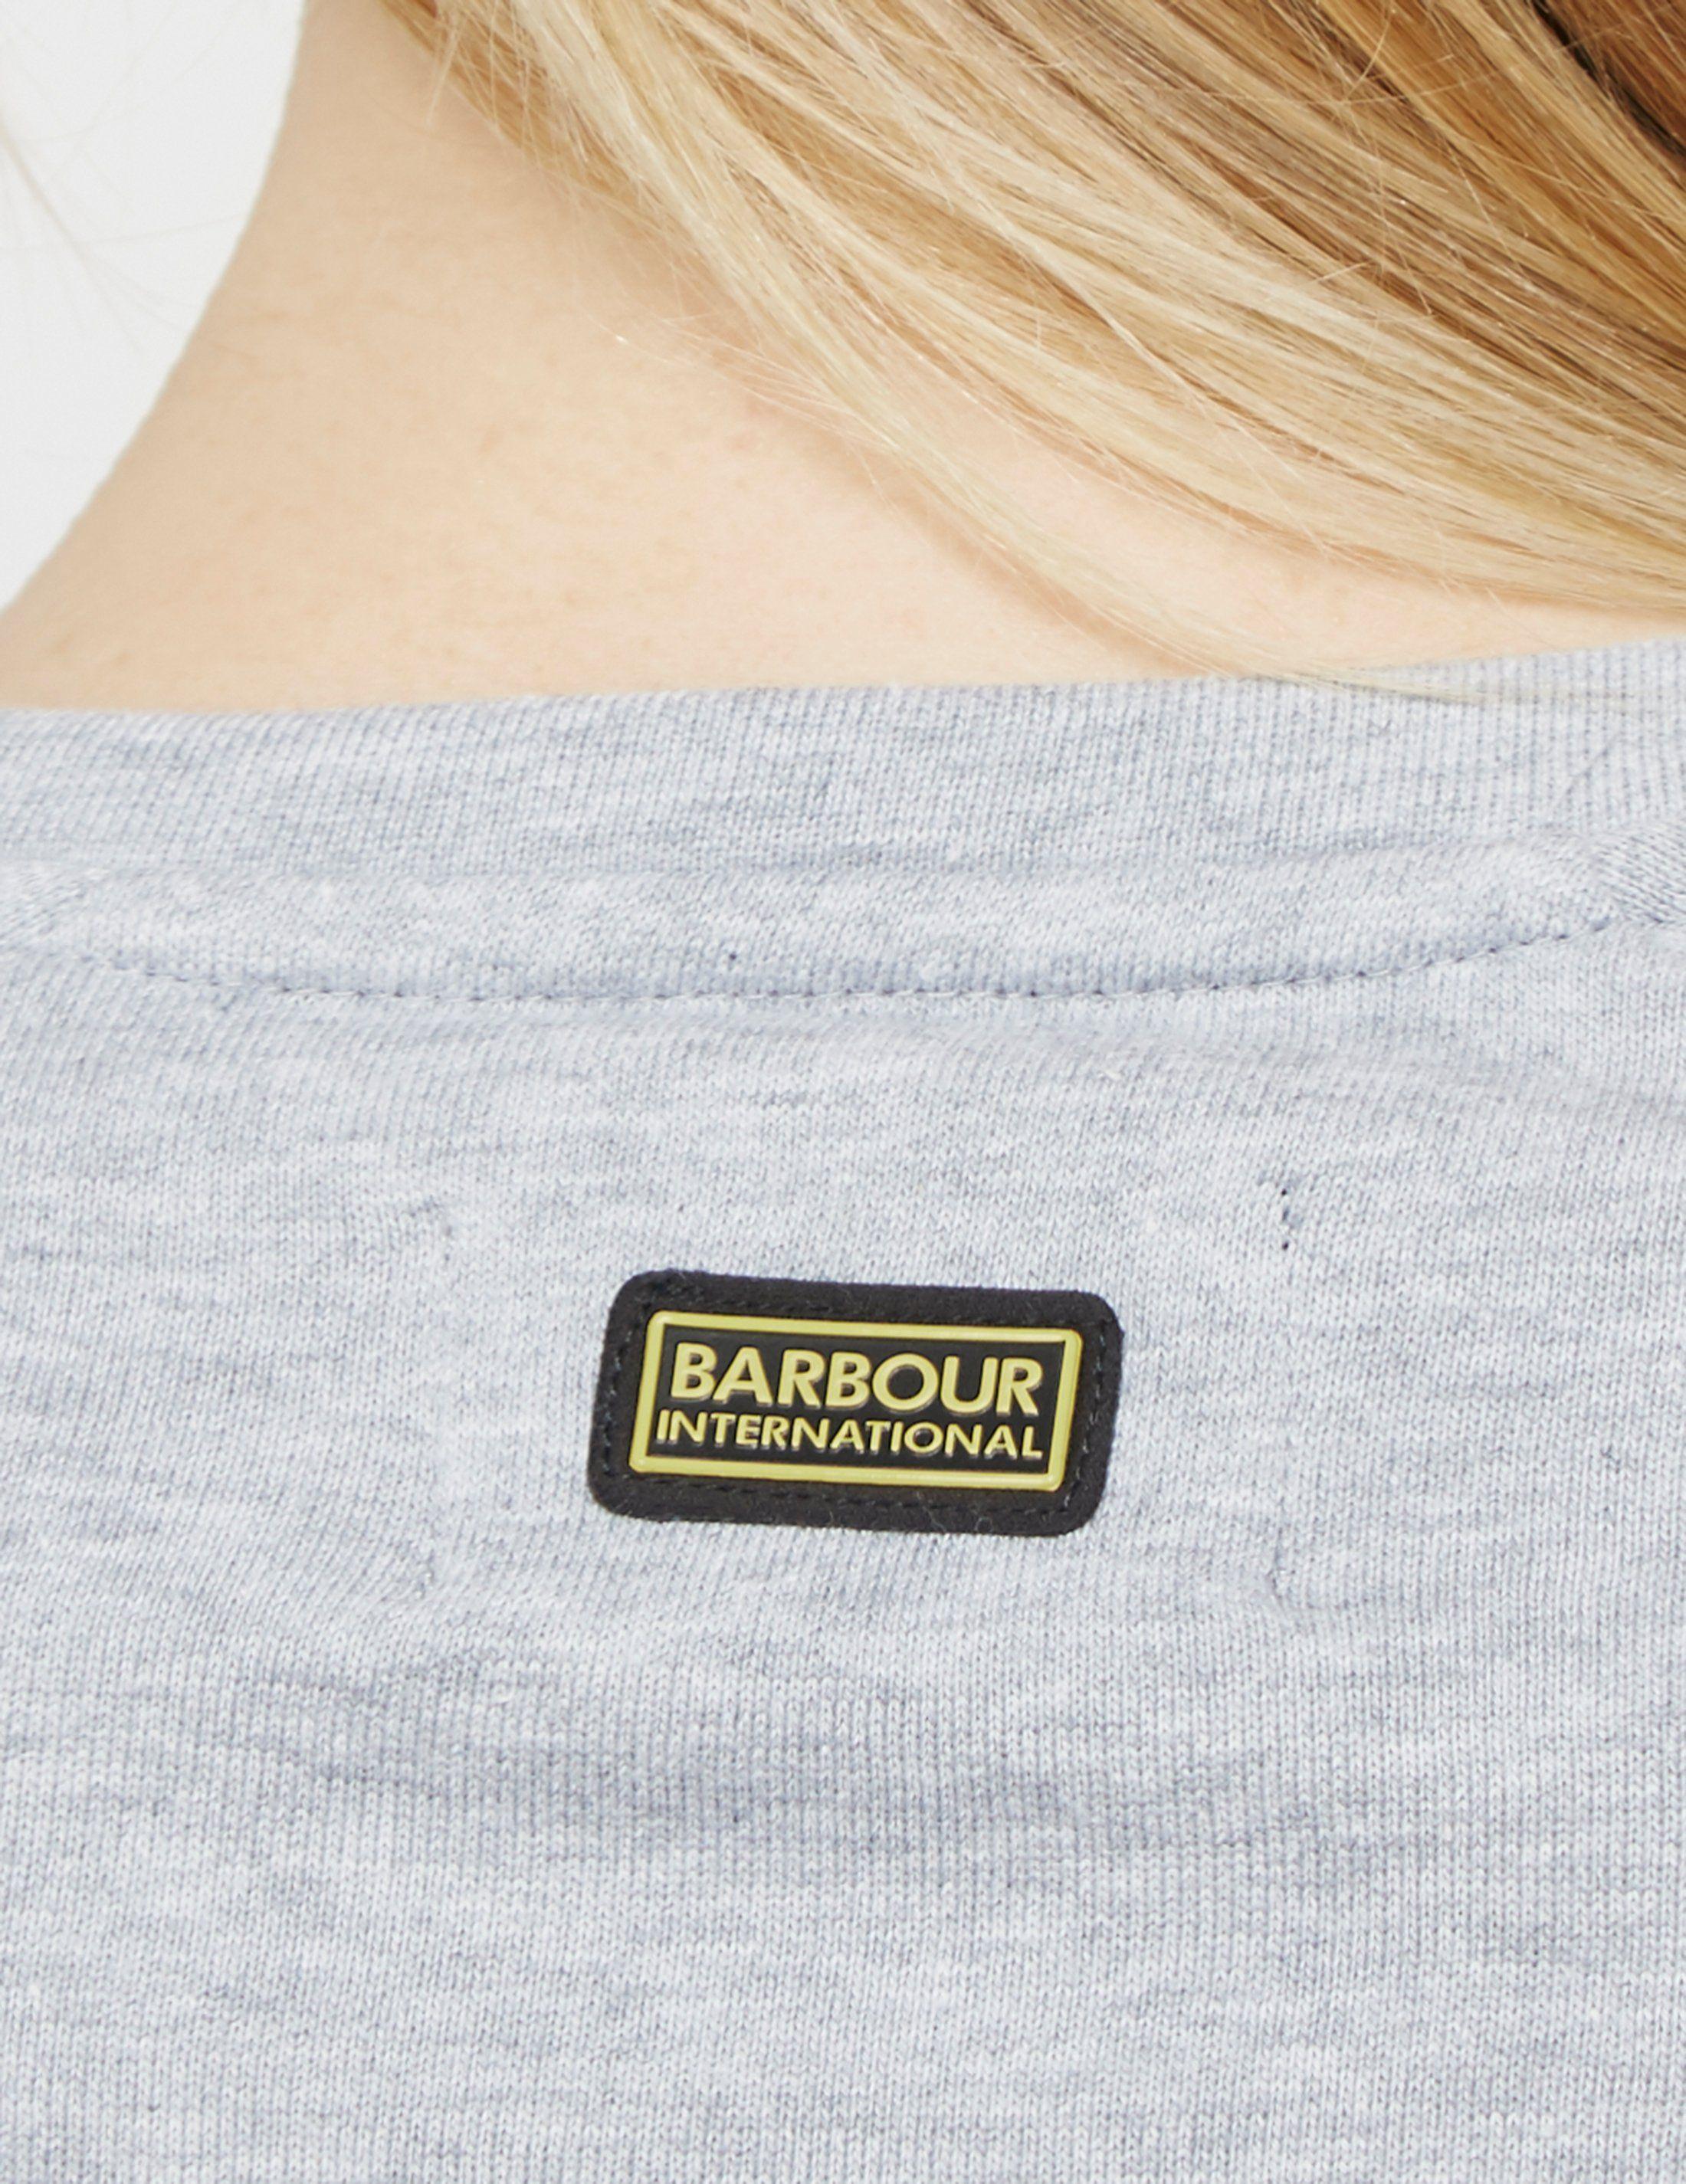 Barbour International Bearings Sweat - Online Exclusive